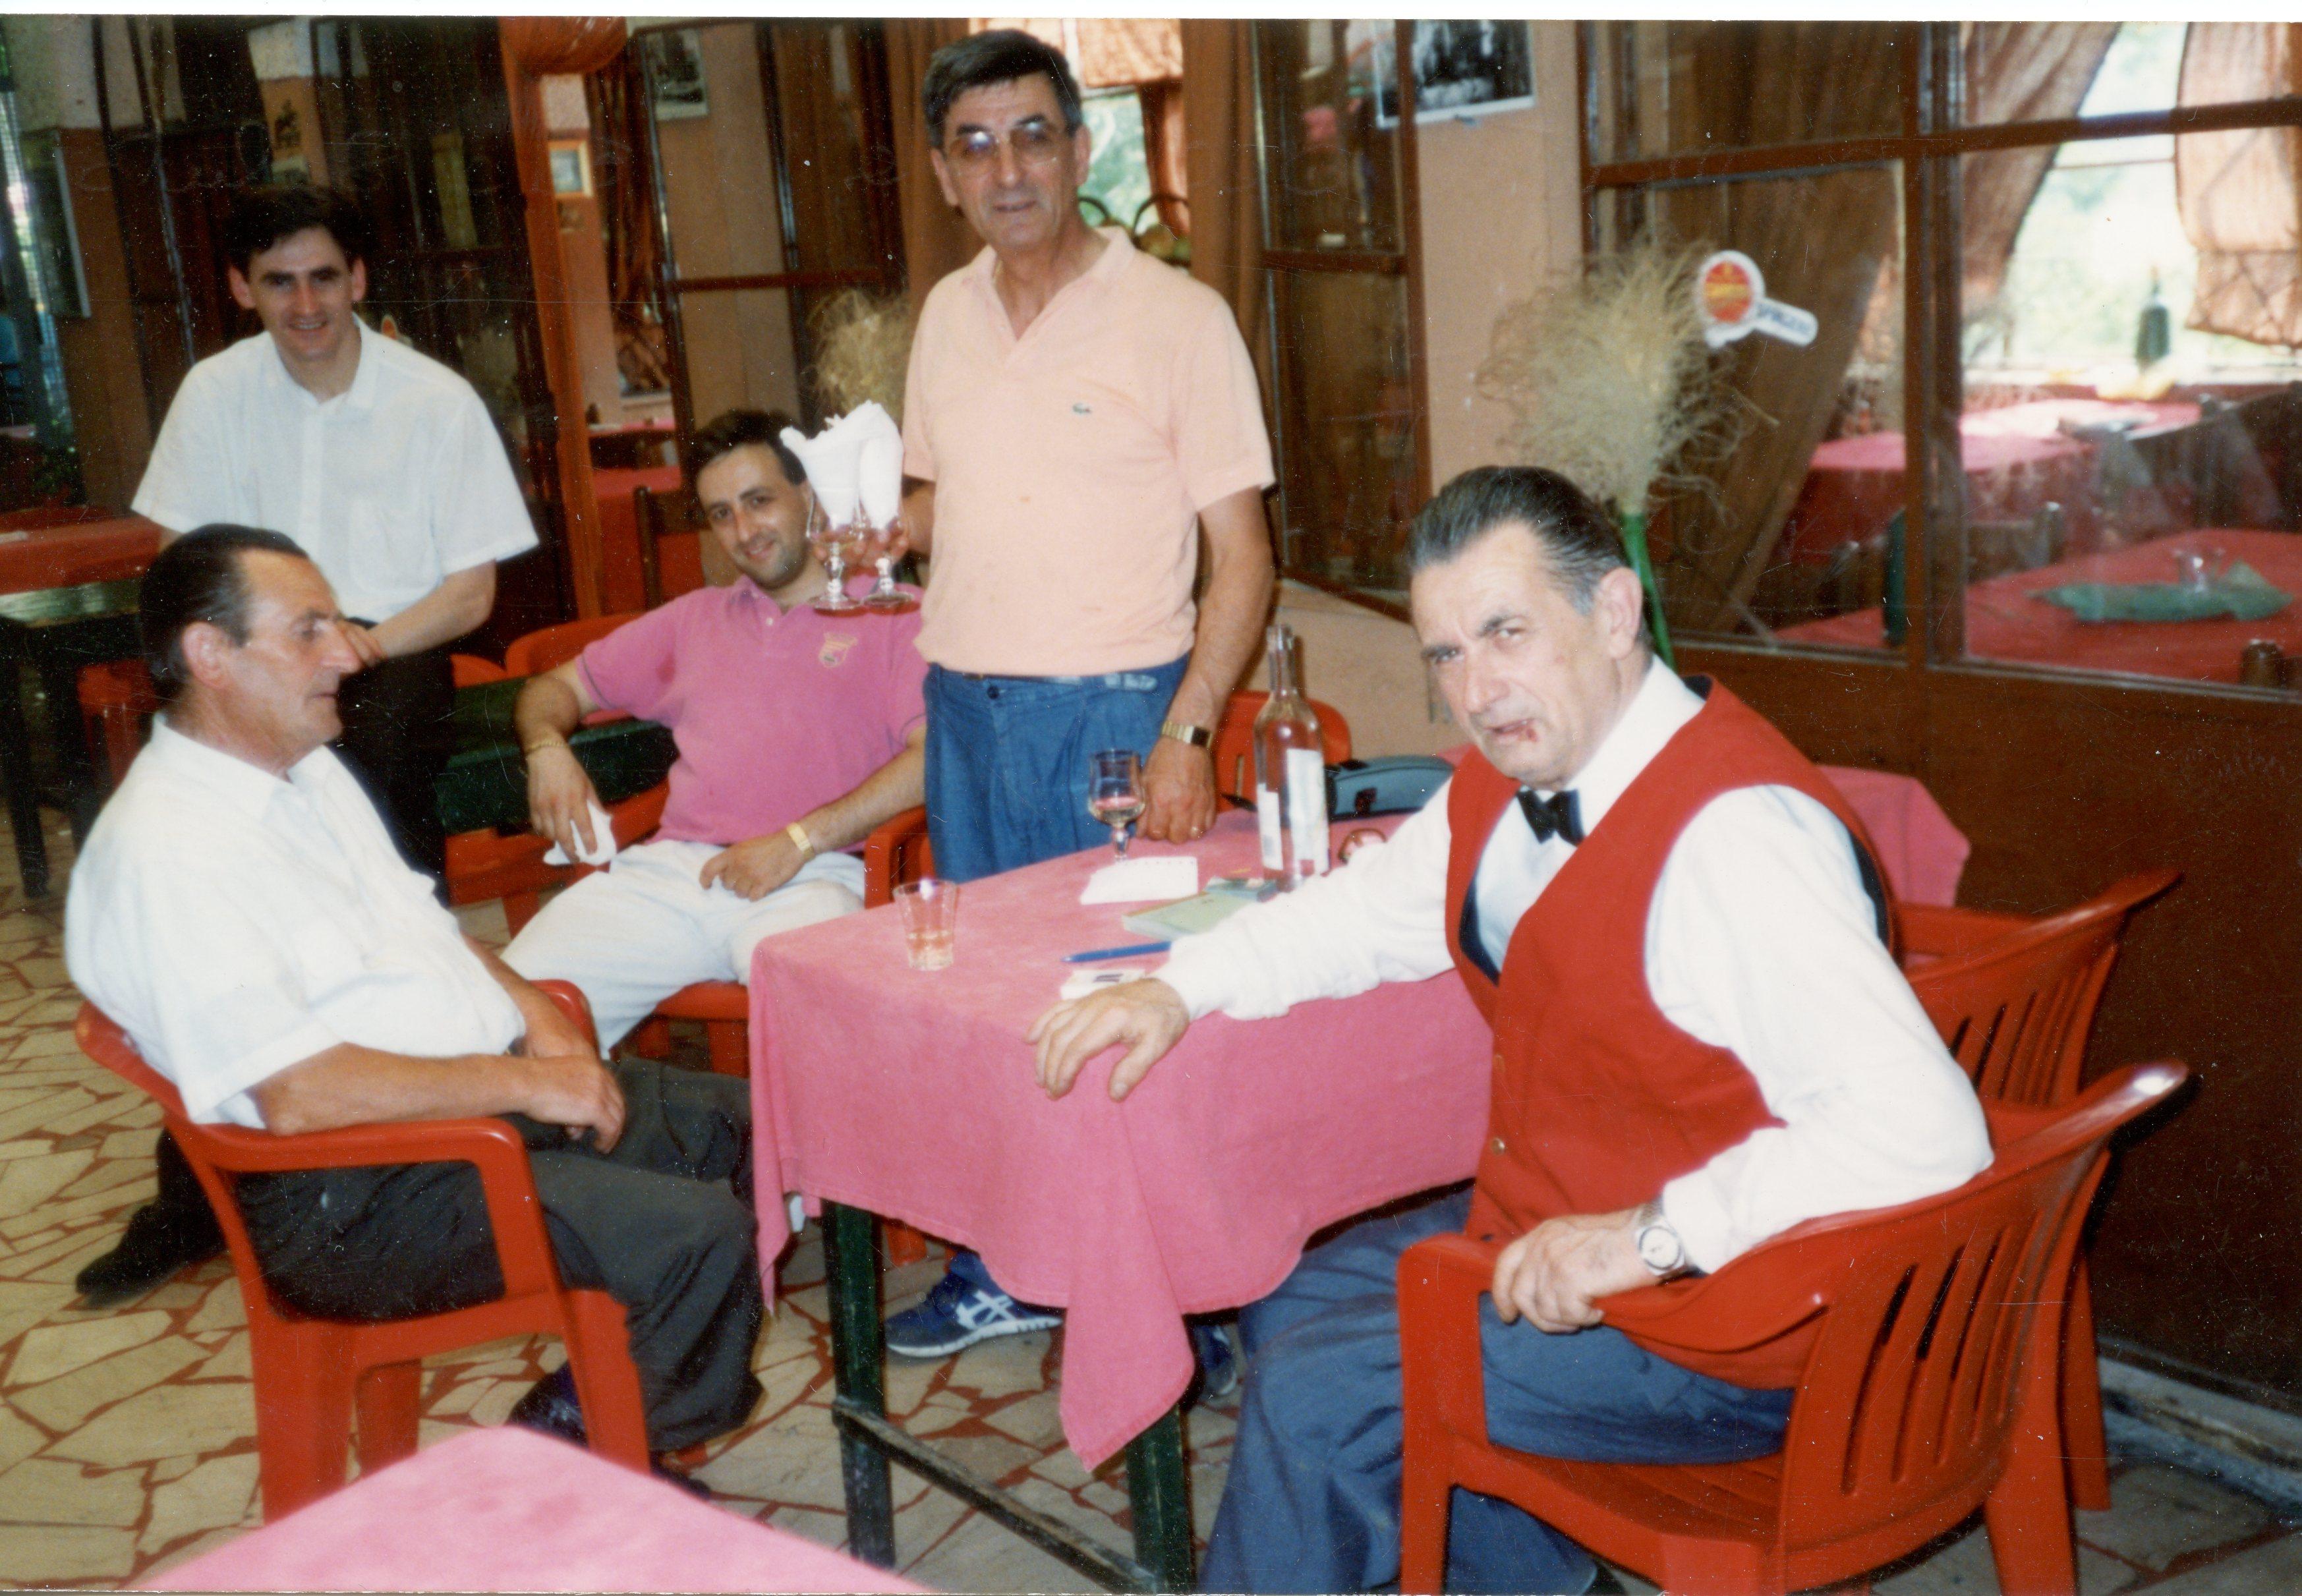 Roberto, Fabio, Franco, Angelo e Mario Fransesini